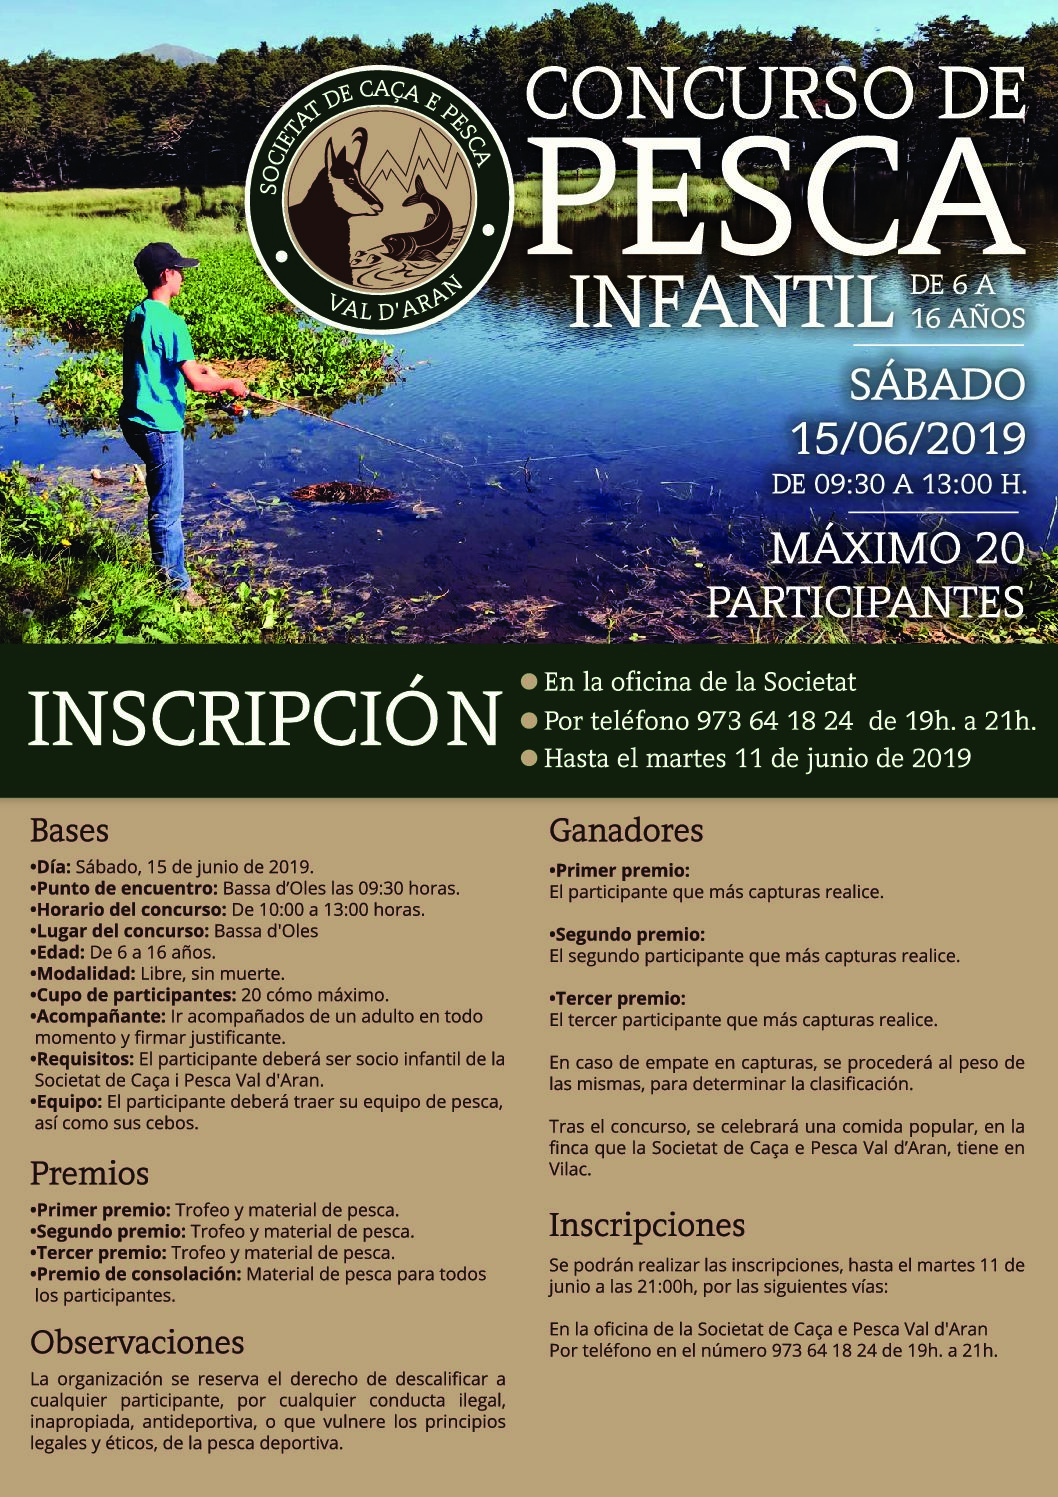 CONCURSO DE PESCA INFANTIL 2019